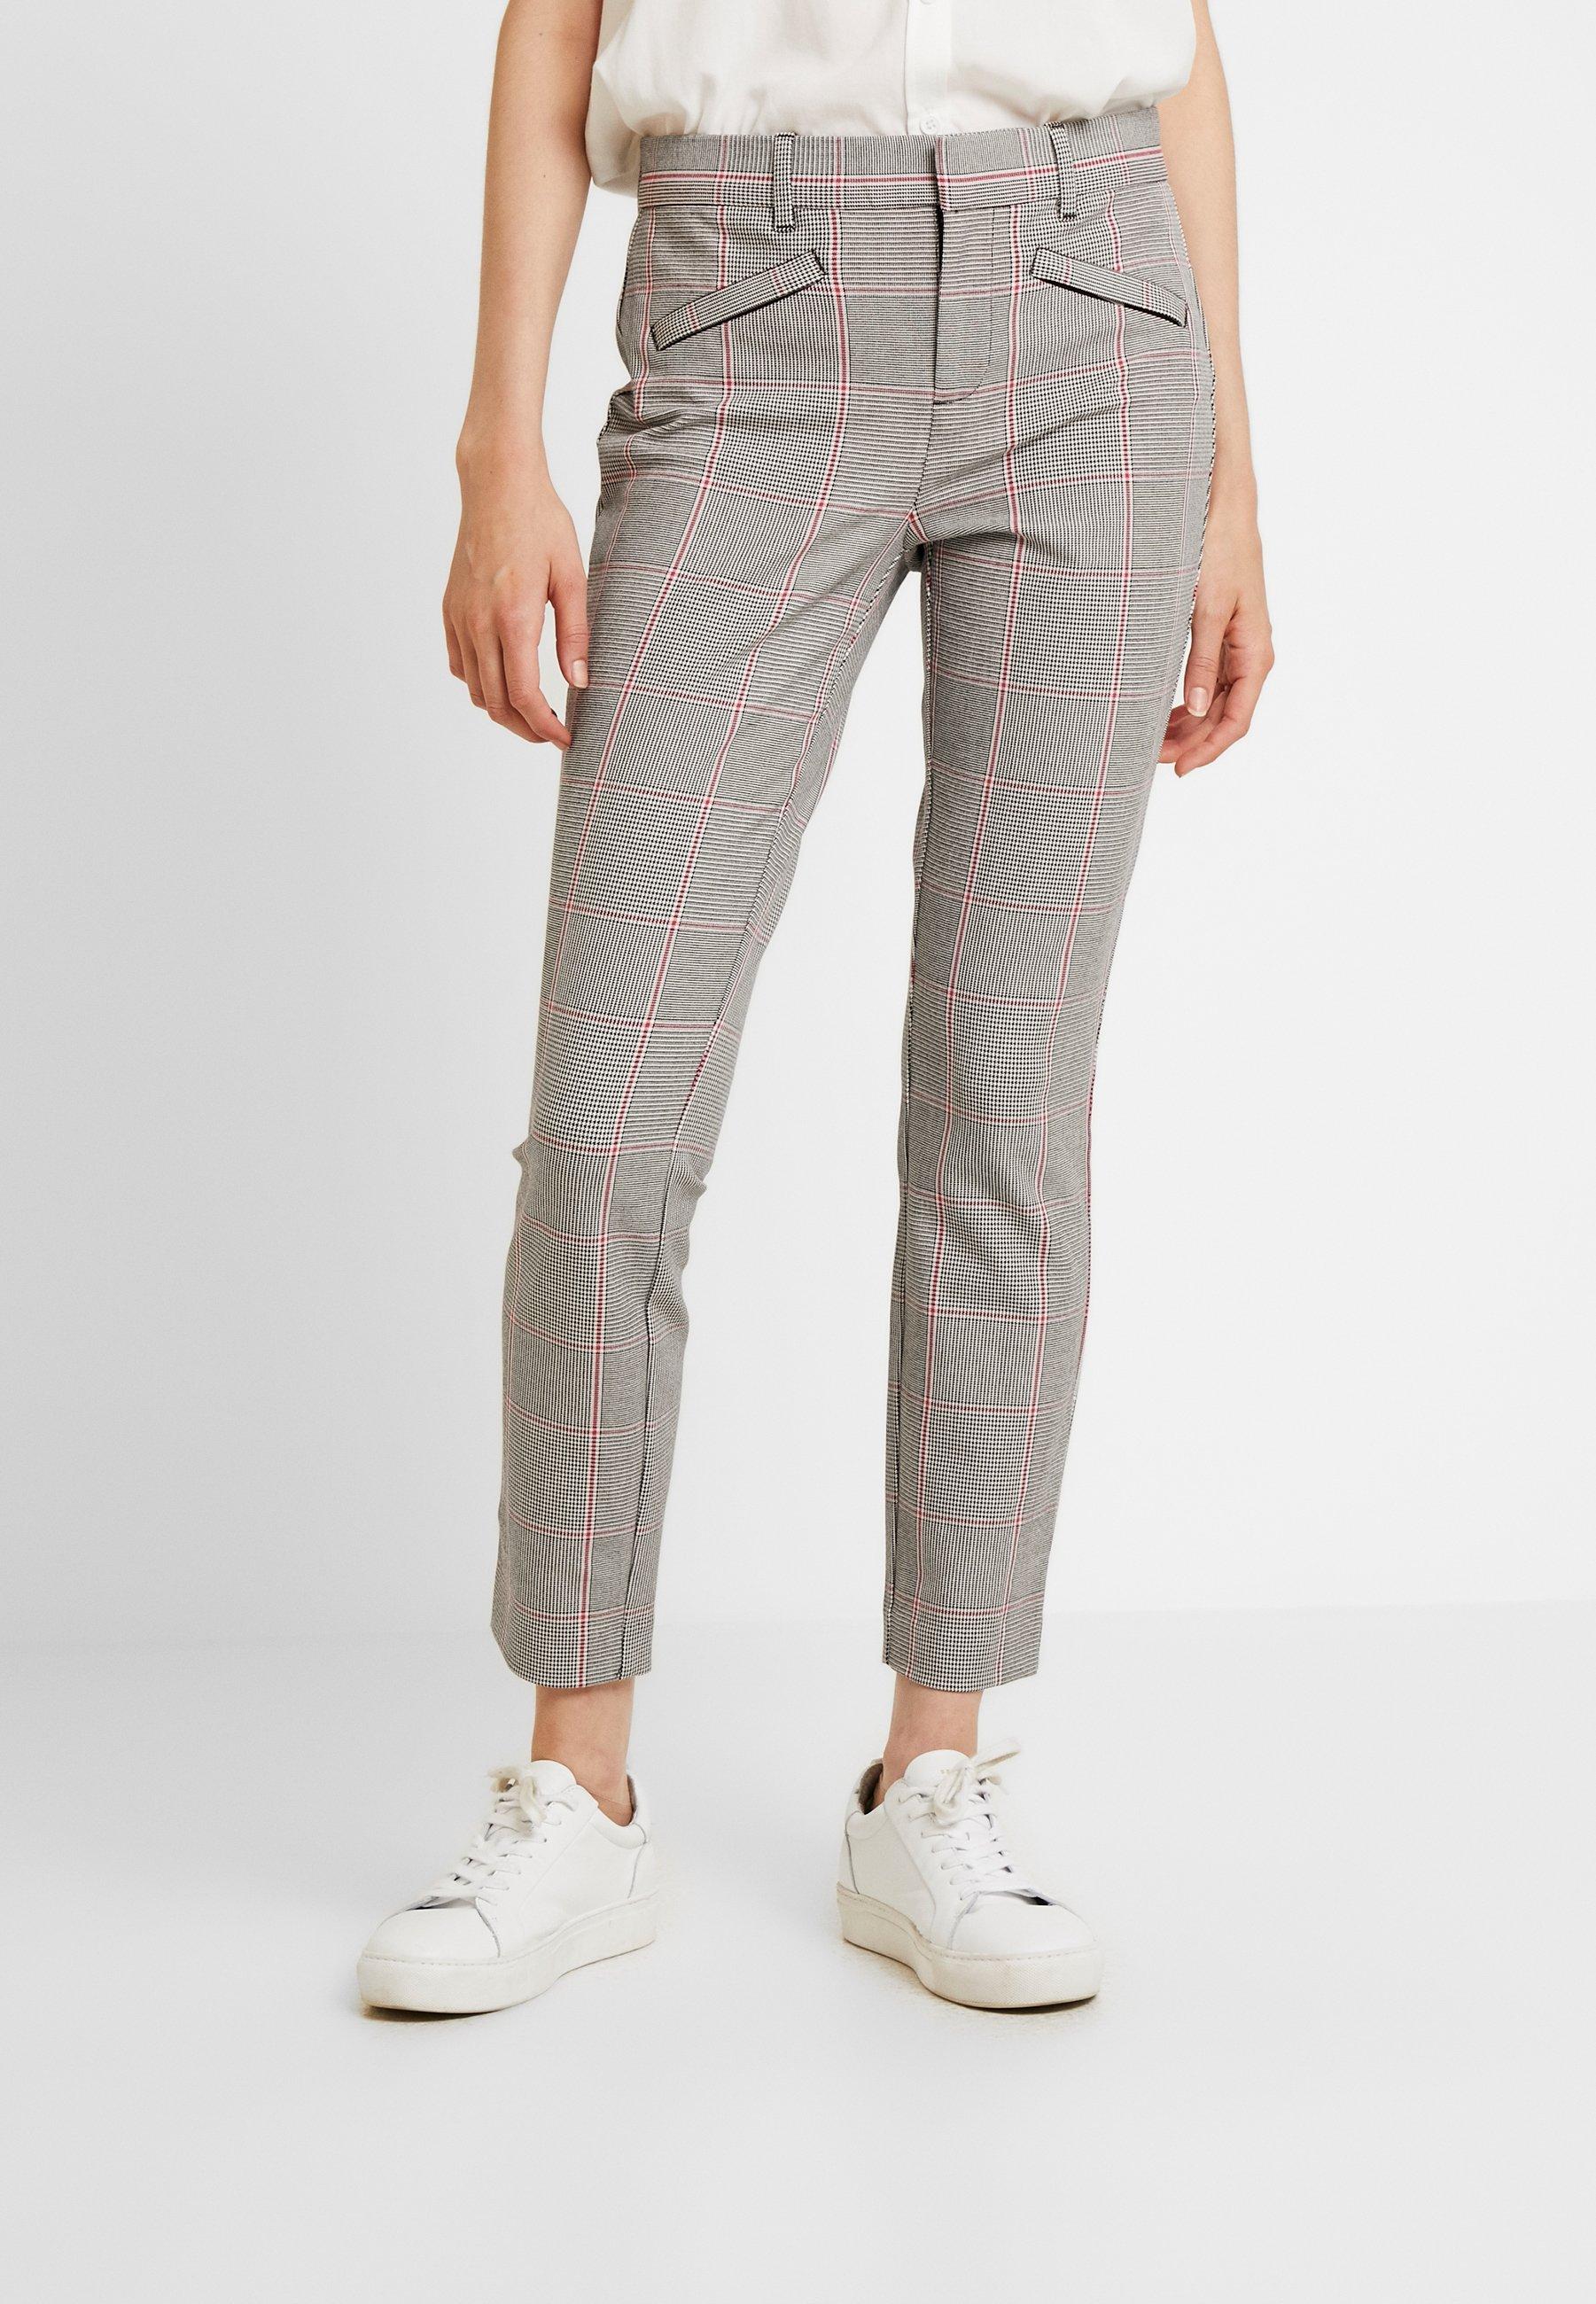 Gap Classique Grey AnklePantalon Gap pink QthCxsrd